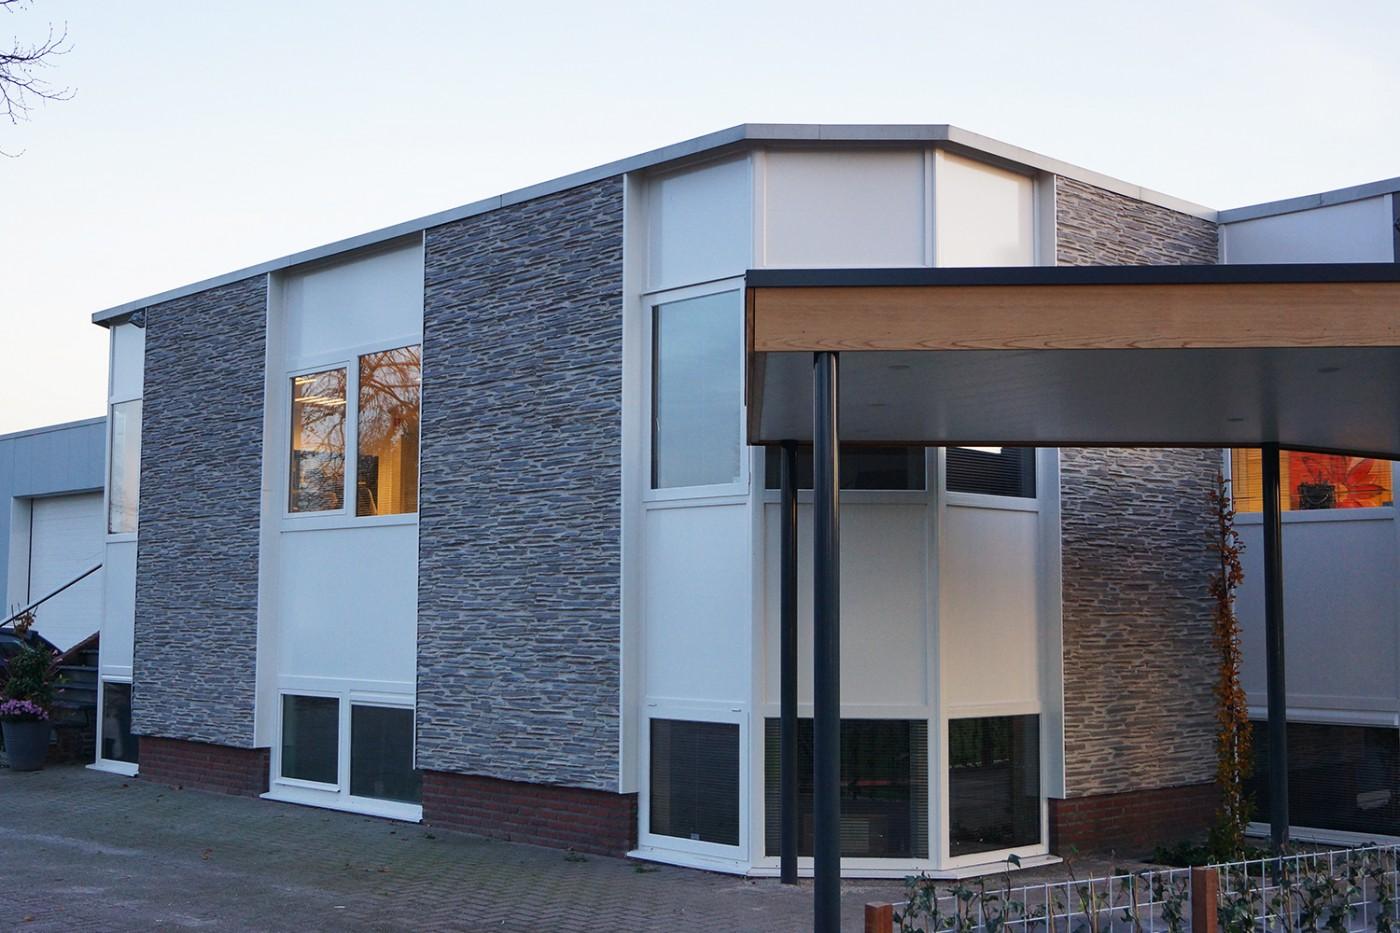 Panel piedra laja fina combinada for Imitacion piedra para fachadas